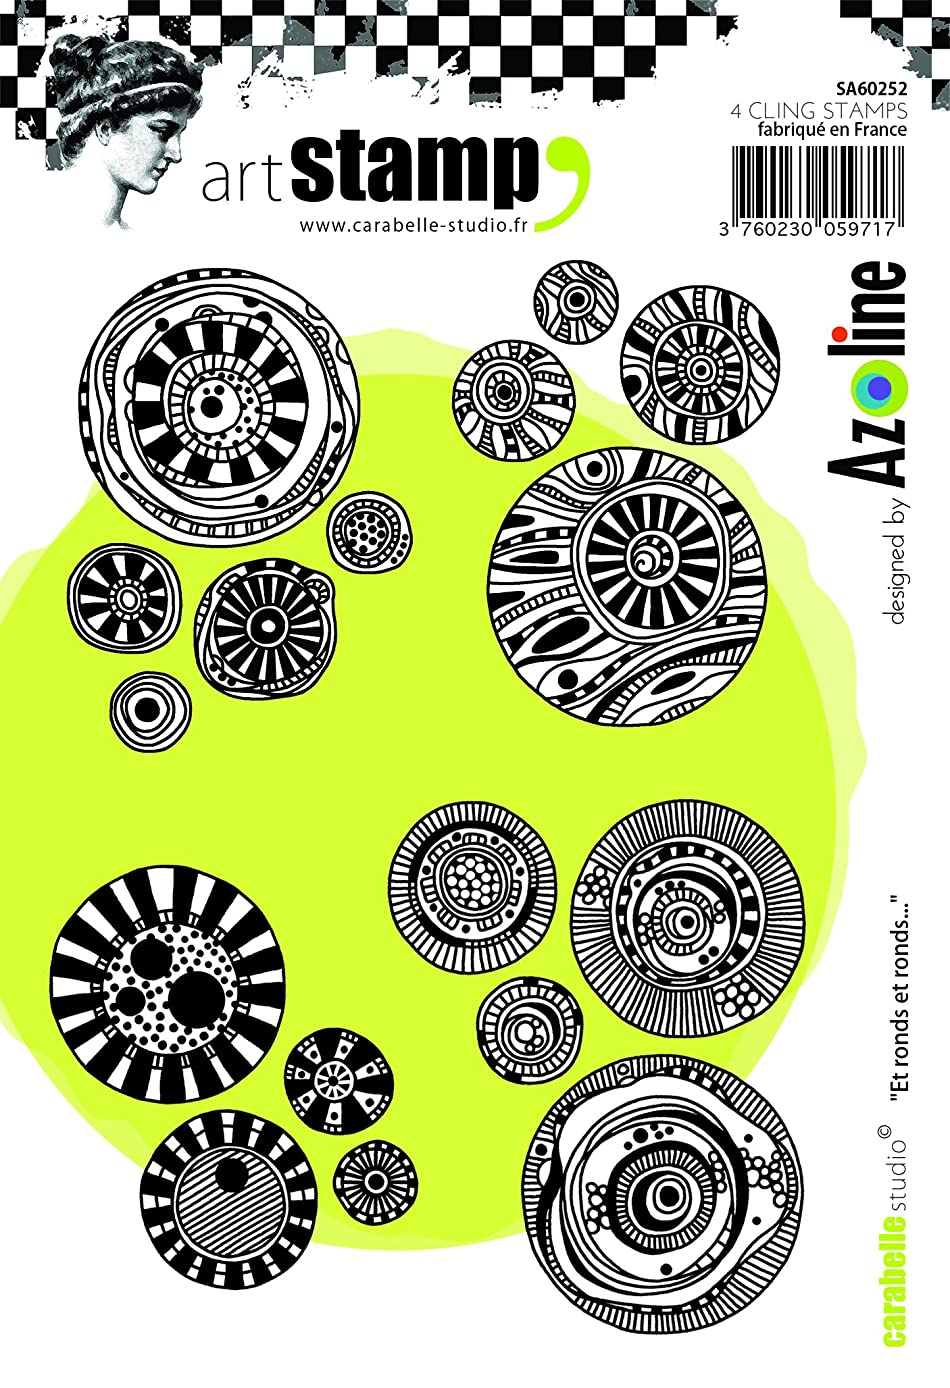 Carabelle Studio SA60252 A6 Stamp Set - Et ronds et ronds... by Azoline